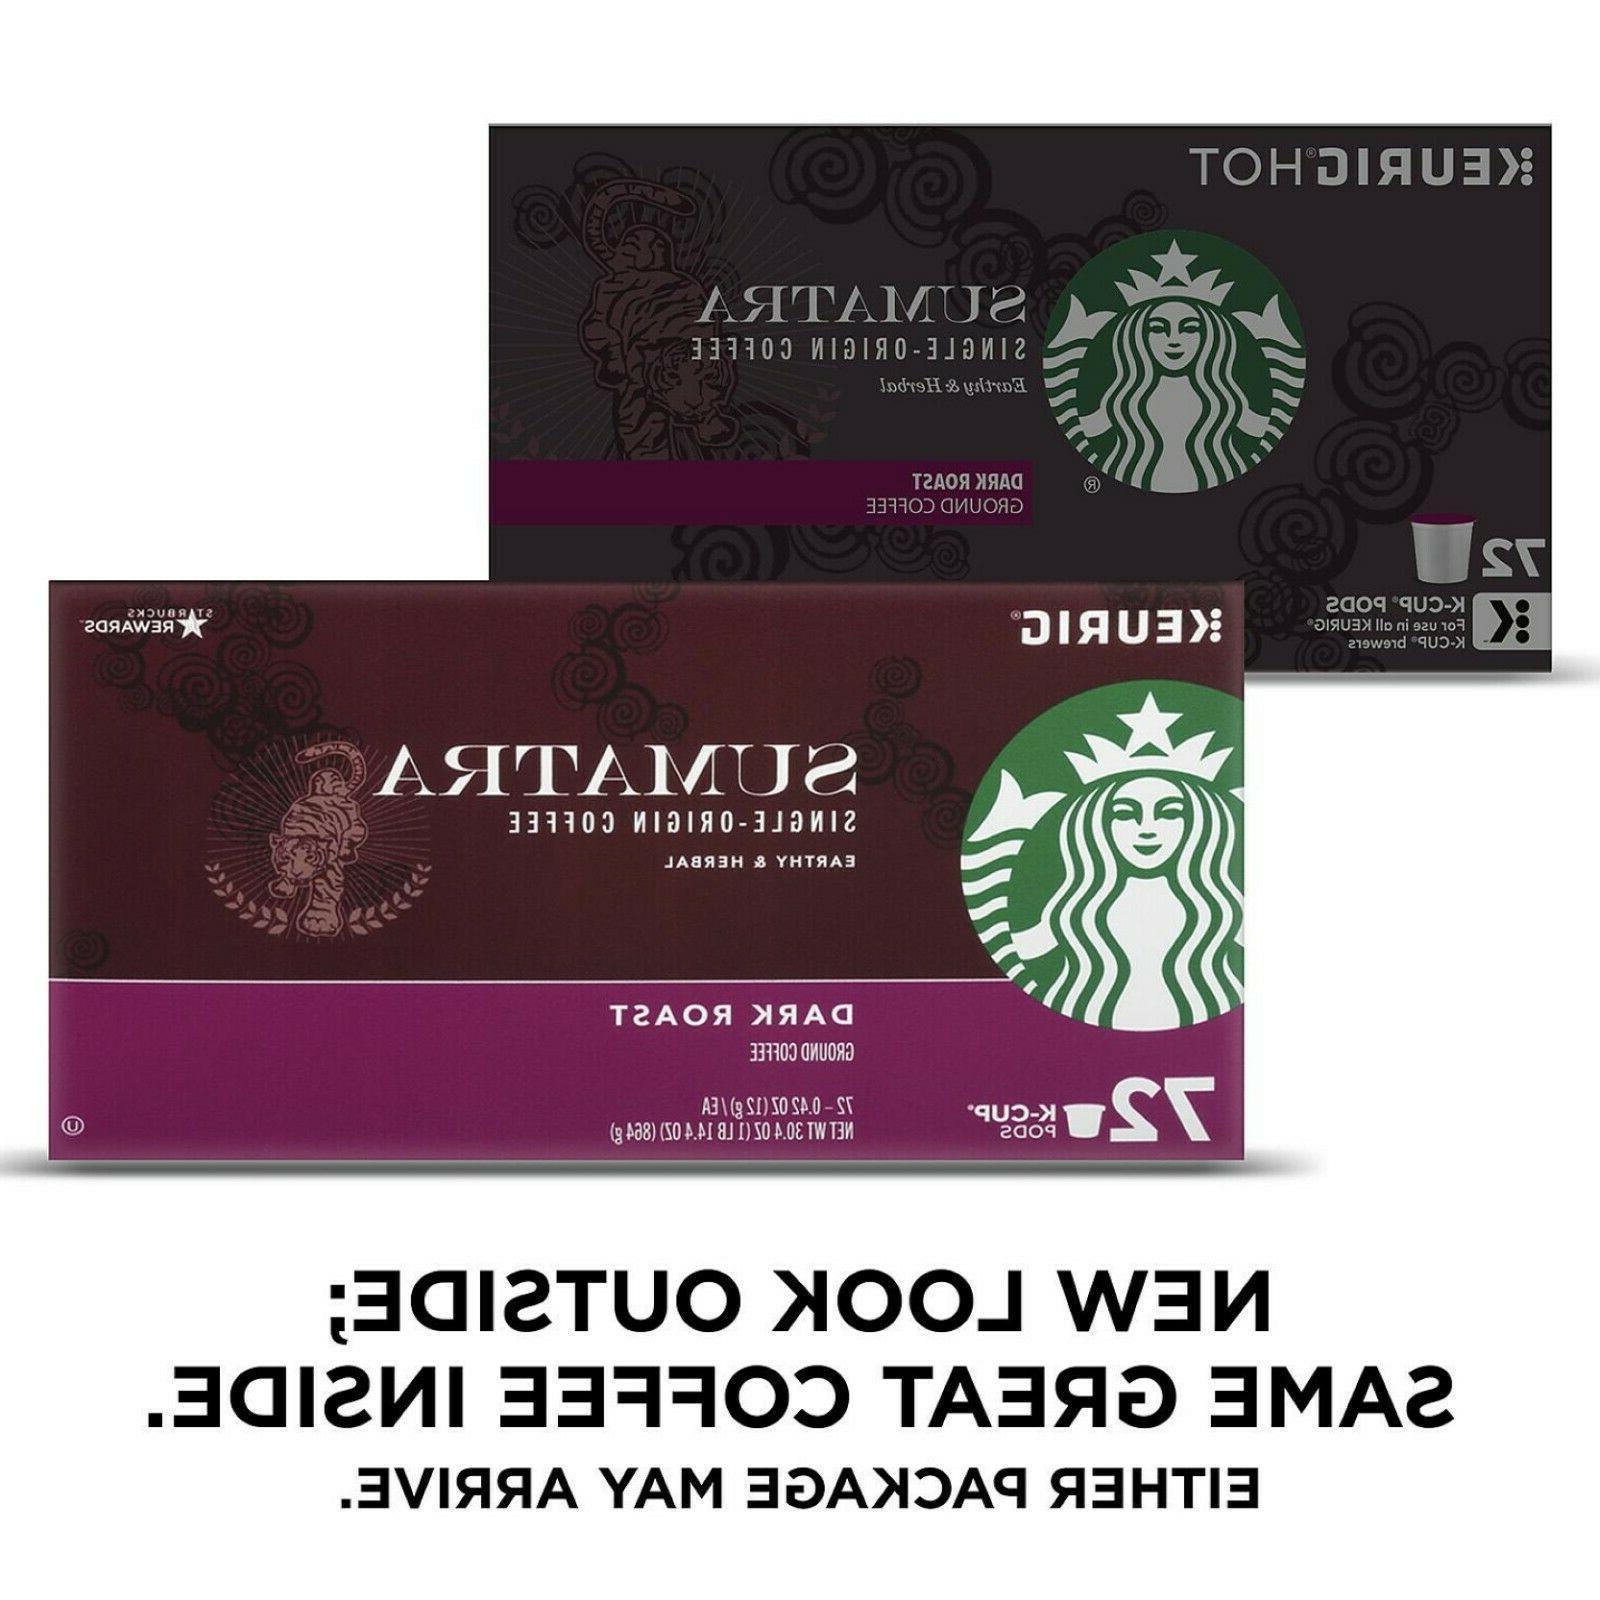 Starbucks Coffee 72 ct.Dark Roast Coffee SHIPPING